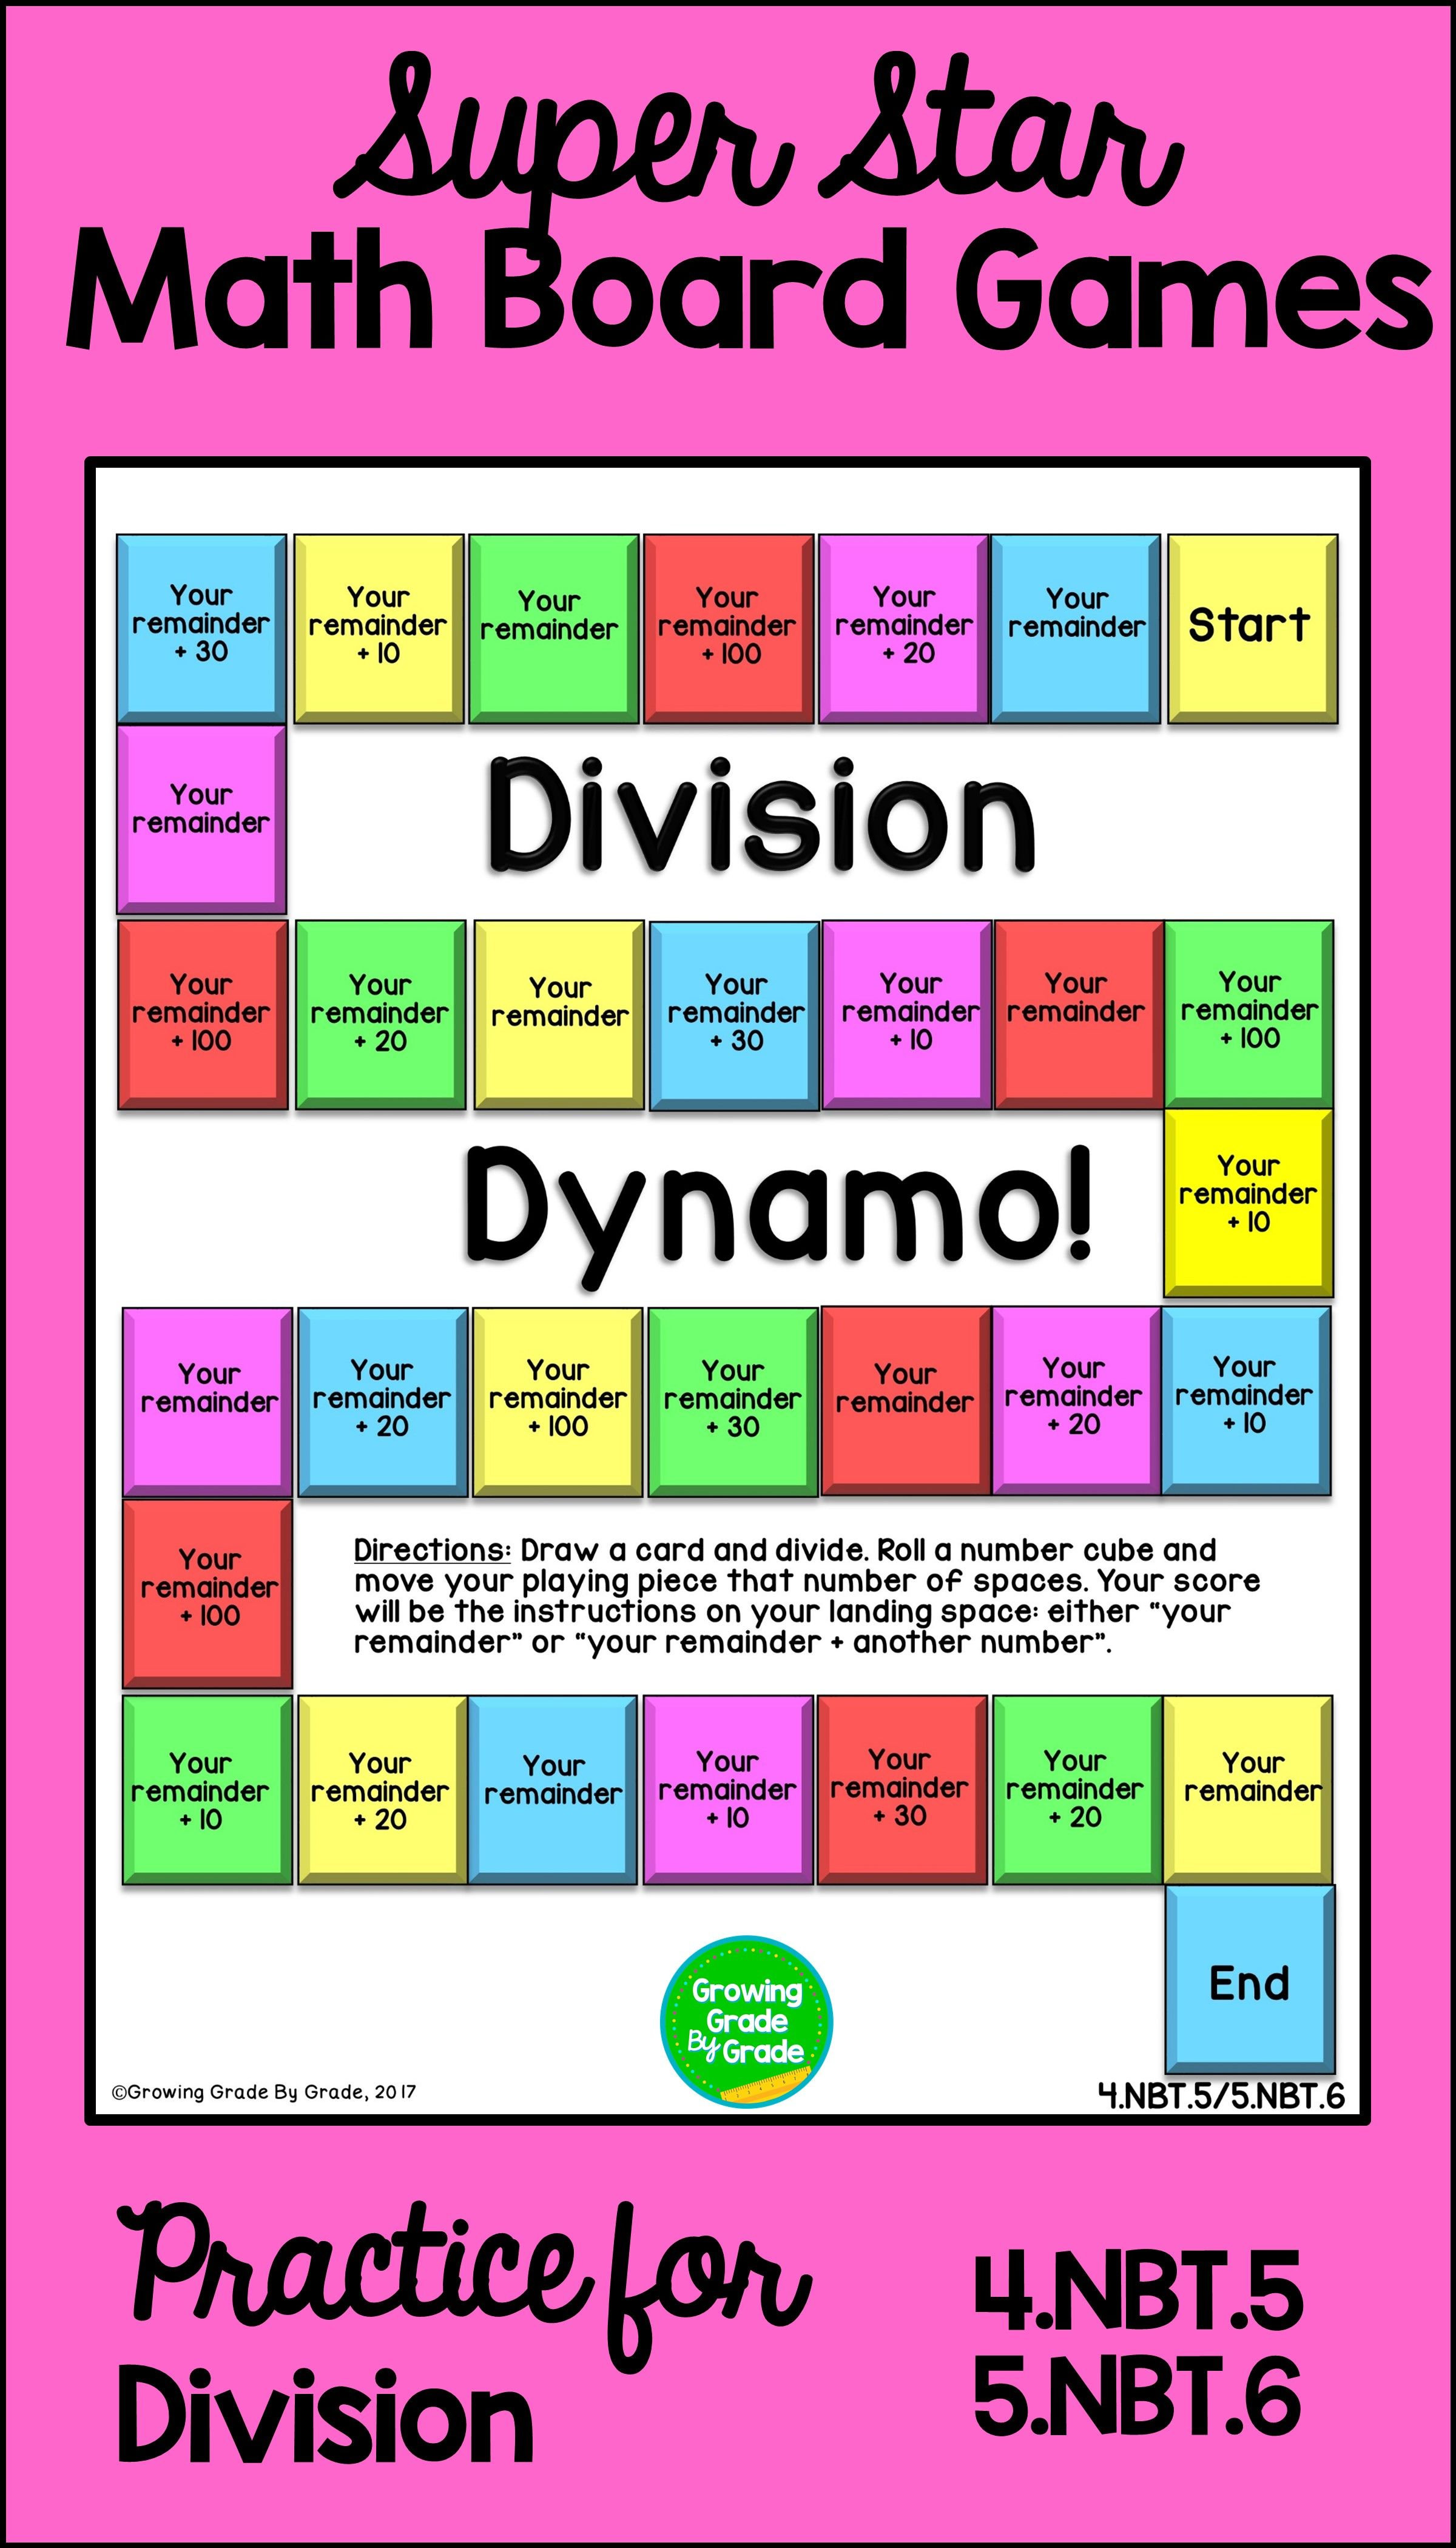 Math Board Games Common Core Math Math Math Skills Practice